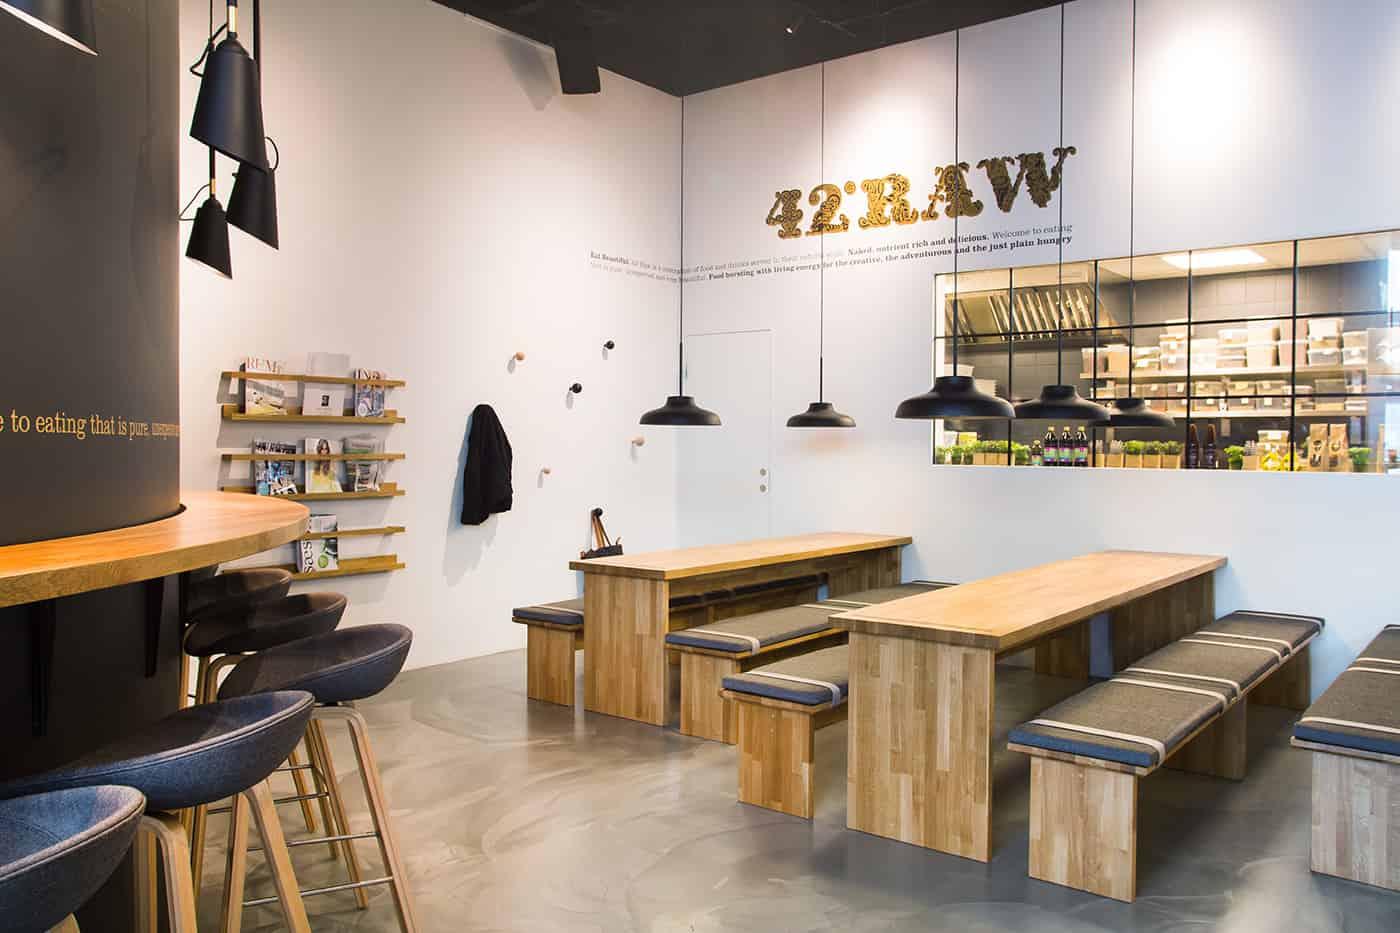 RITAarch, 42RAW, 42RAW Hellerup, indretning, spaceplanning, Cafeindretning, resturantindretning, cafe, siddeområde